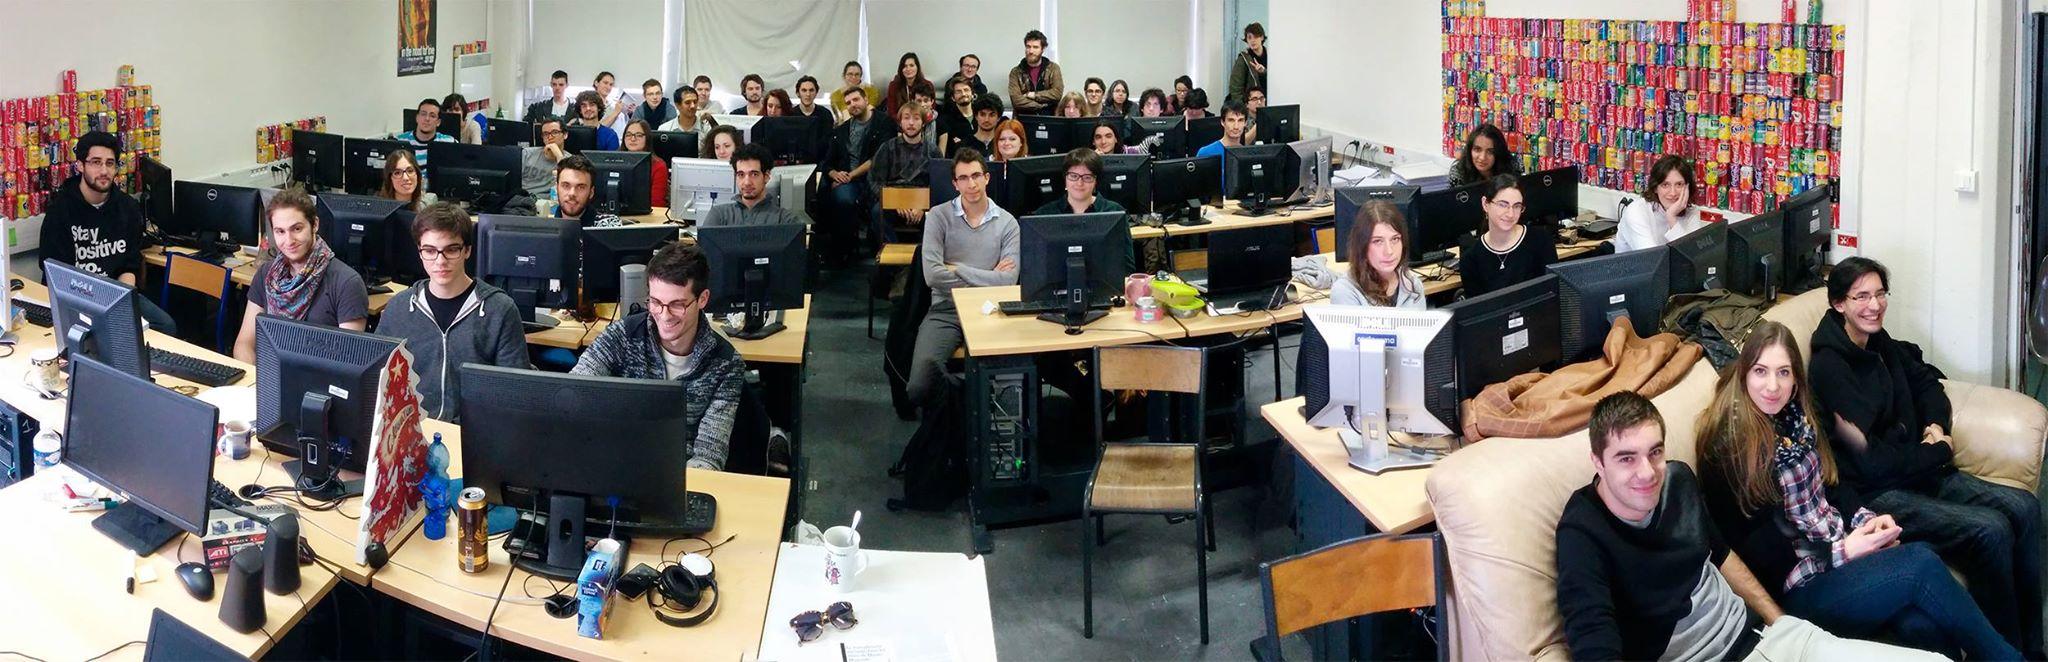 ATI students during the talk by David Revoy